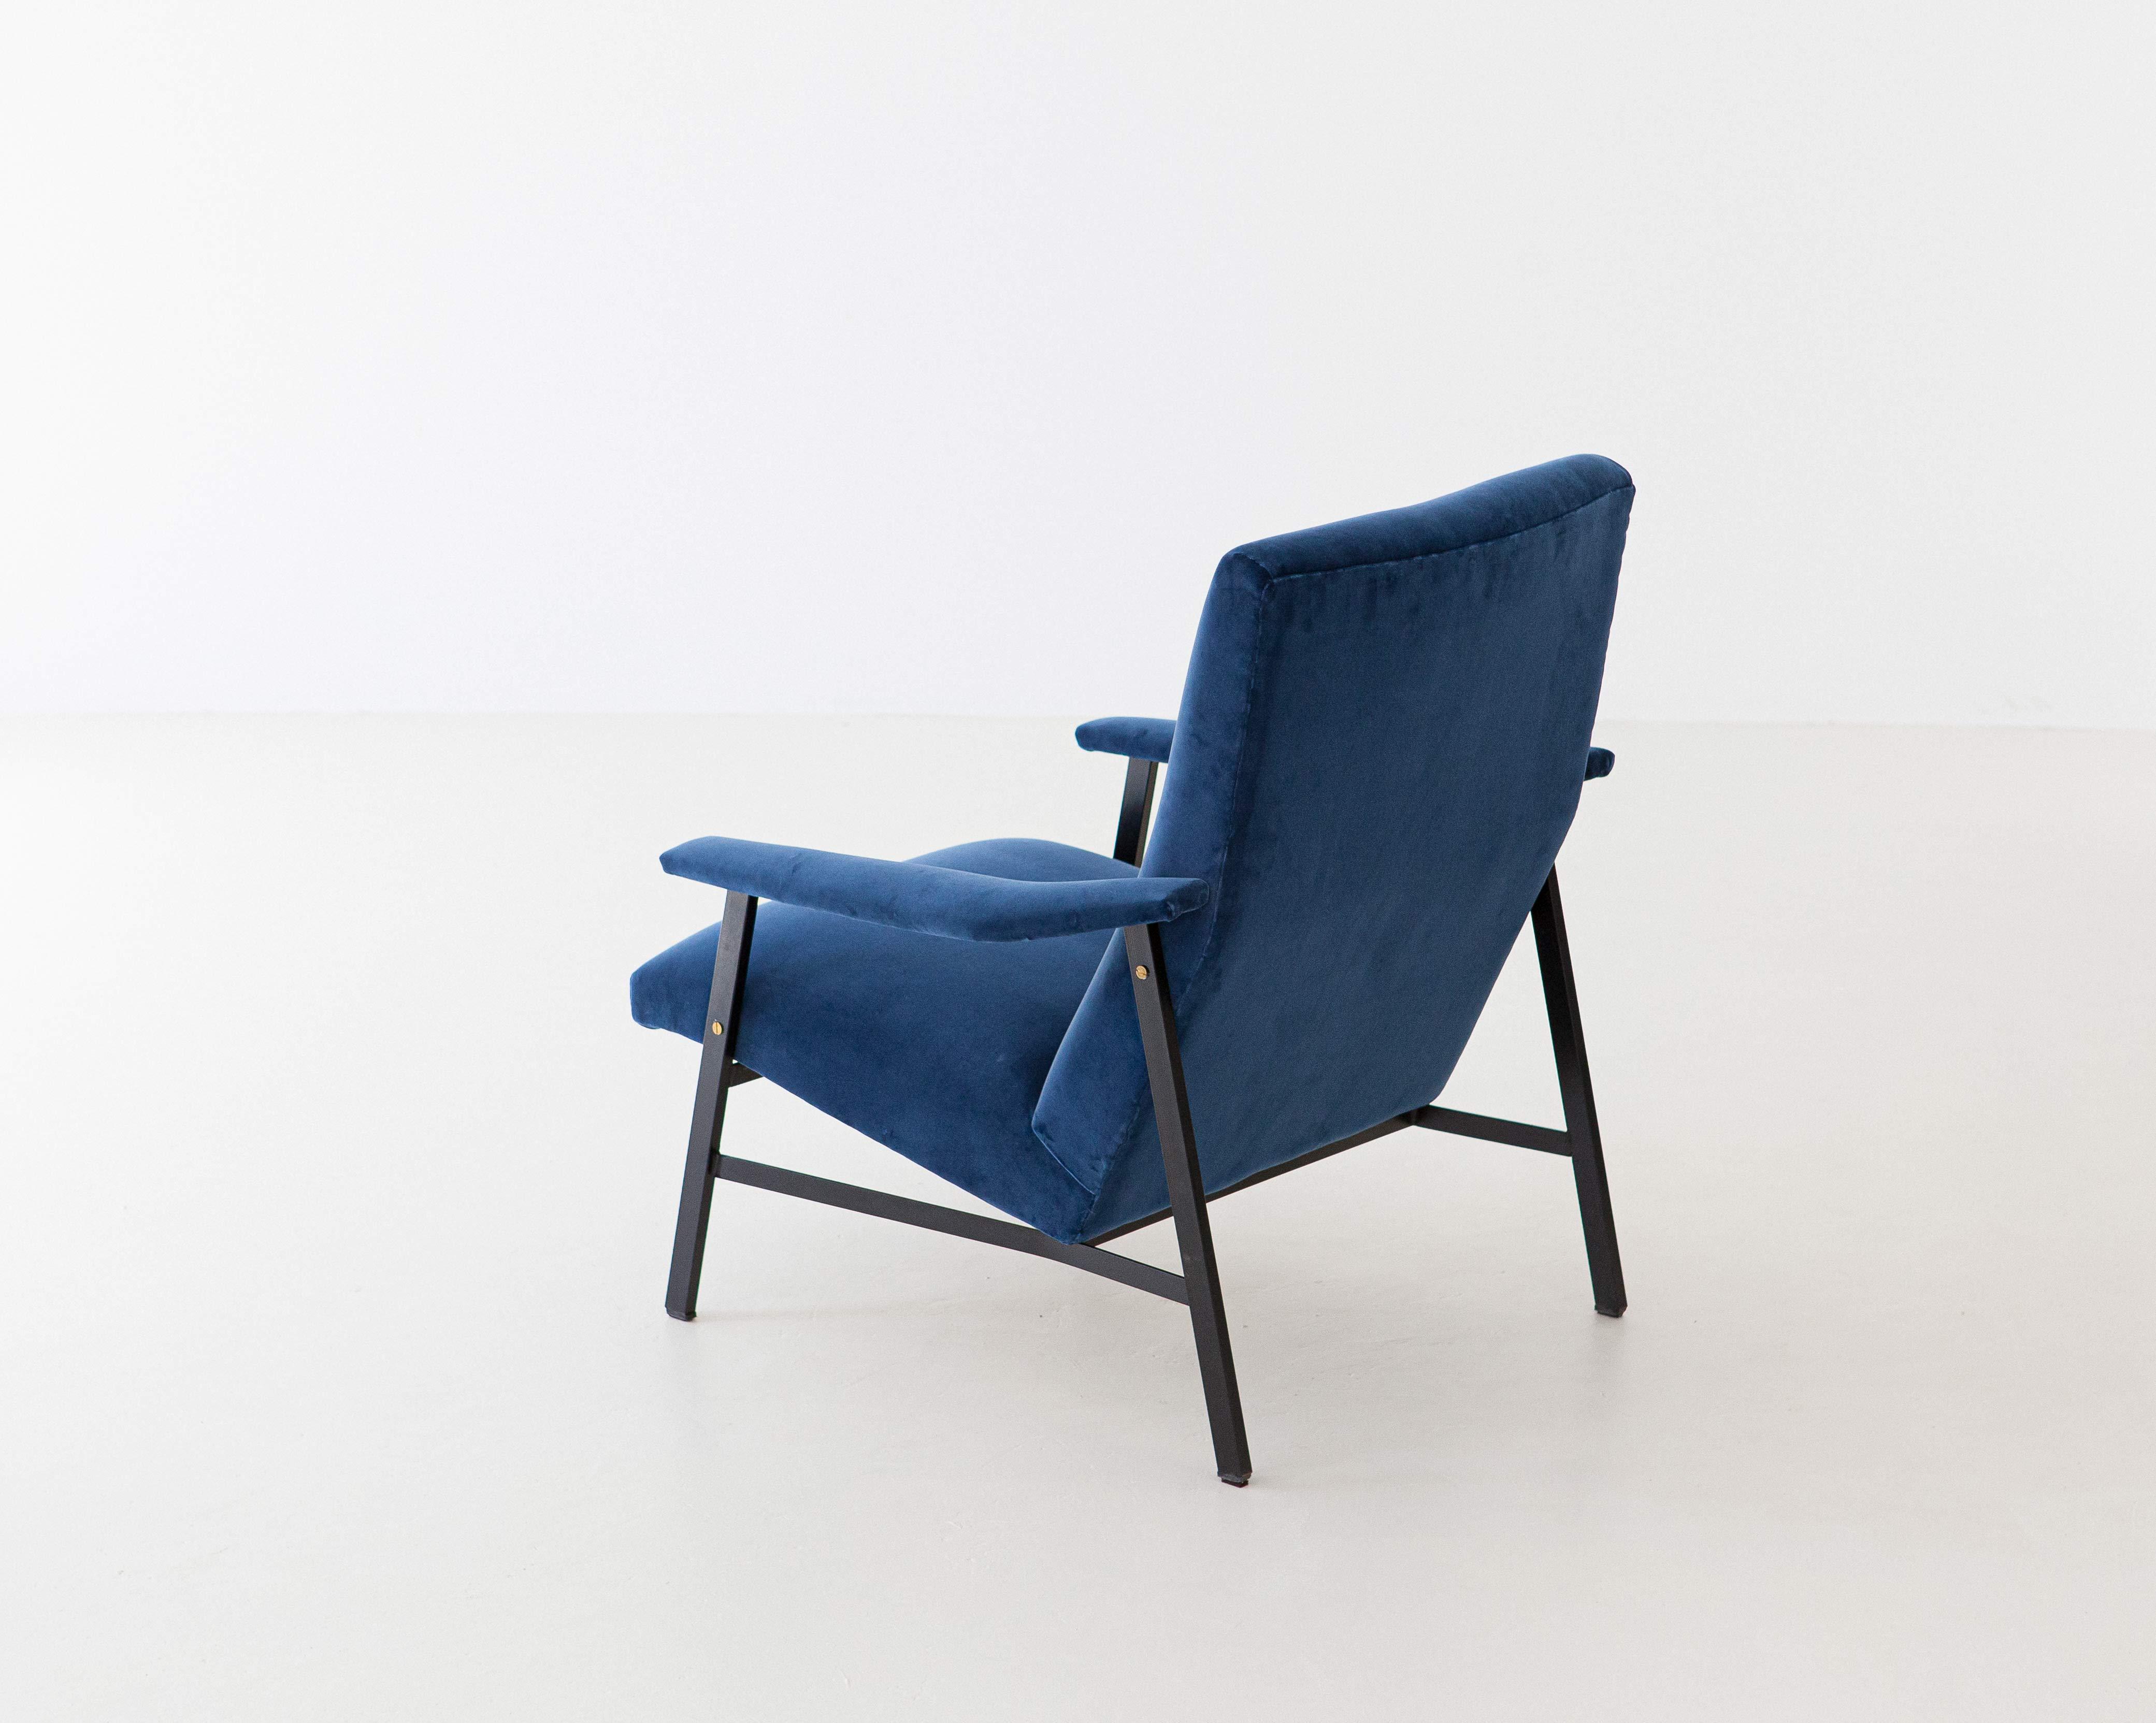 1950s-Italian-blu-velvet-lounge-armchair-6-SE295